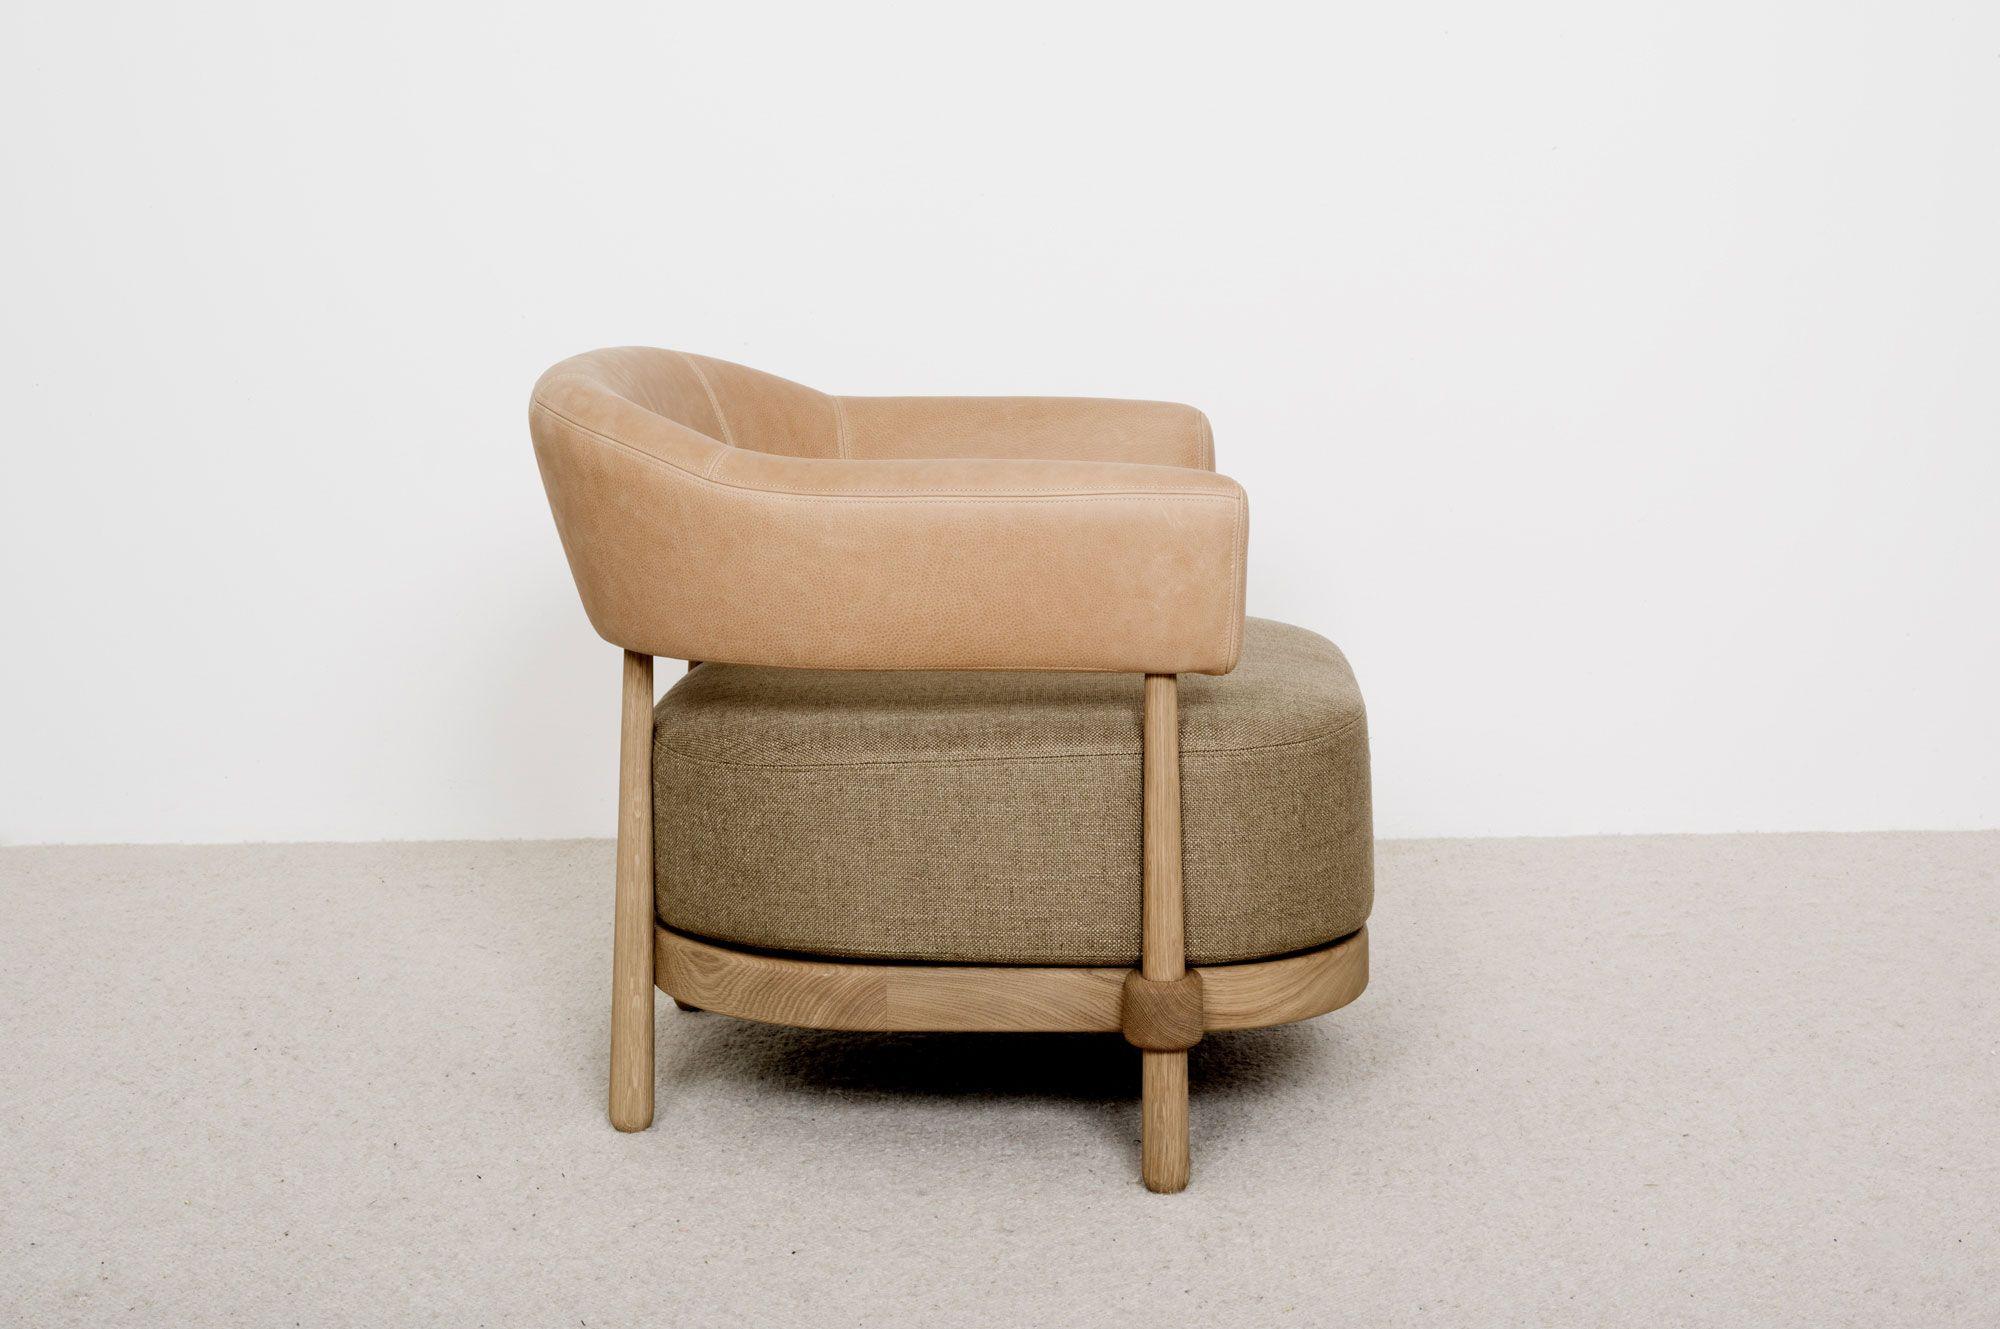 Fauteuil Gum 2 Armchair Furniture Furniture Interior Furniture